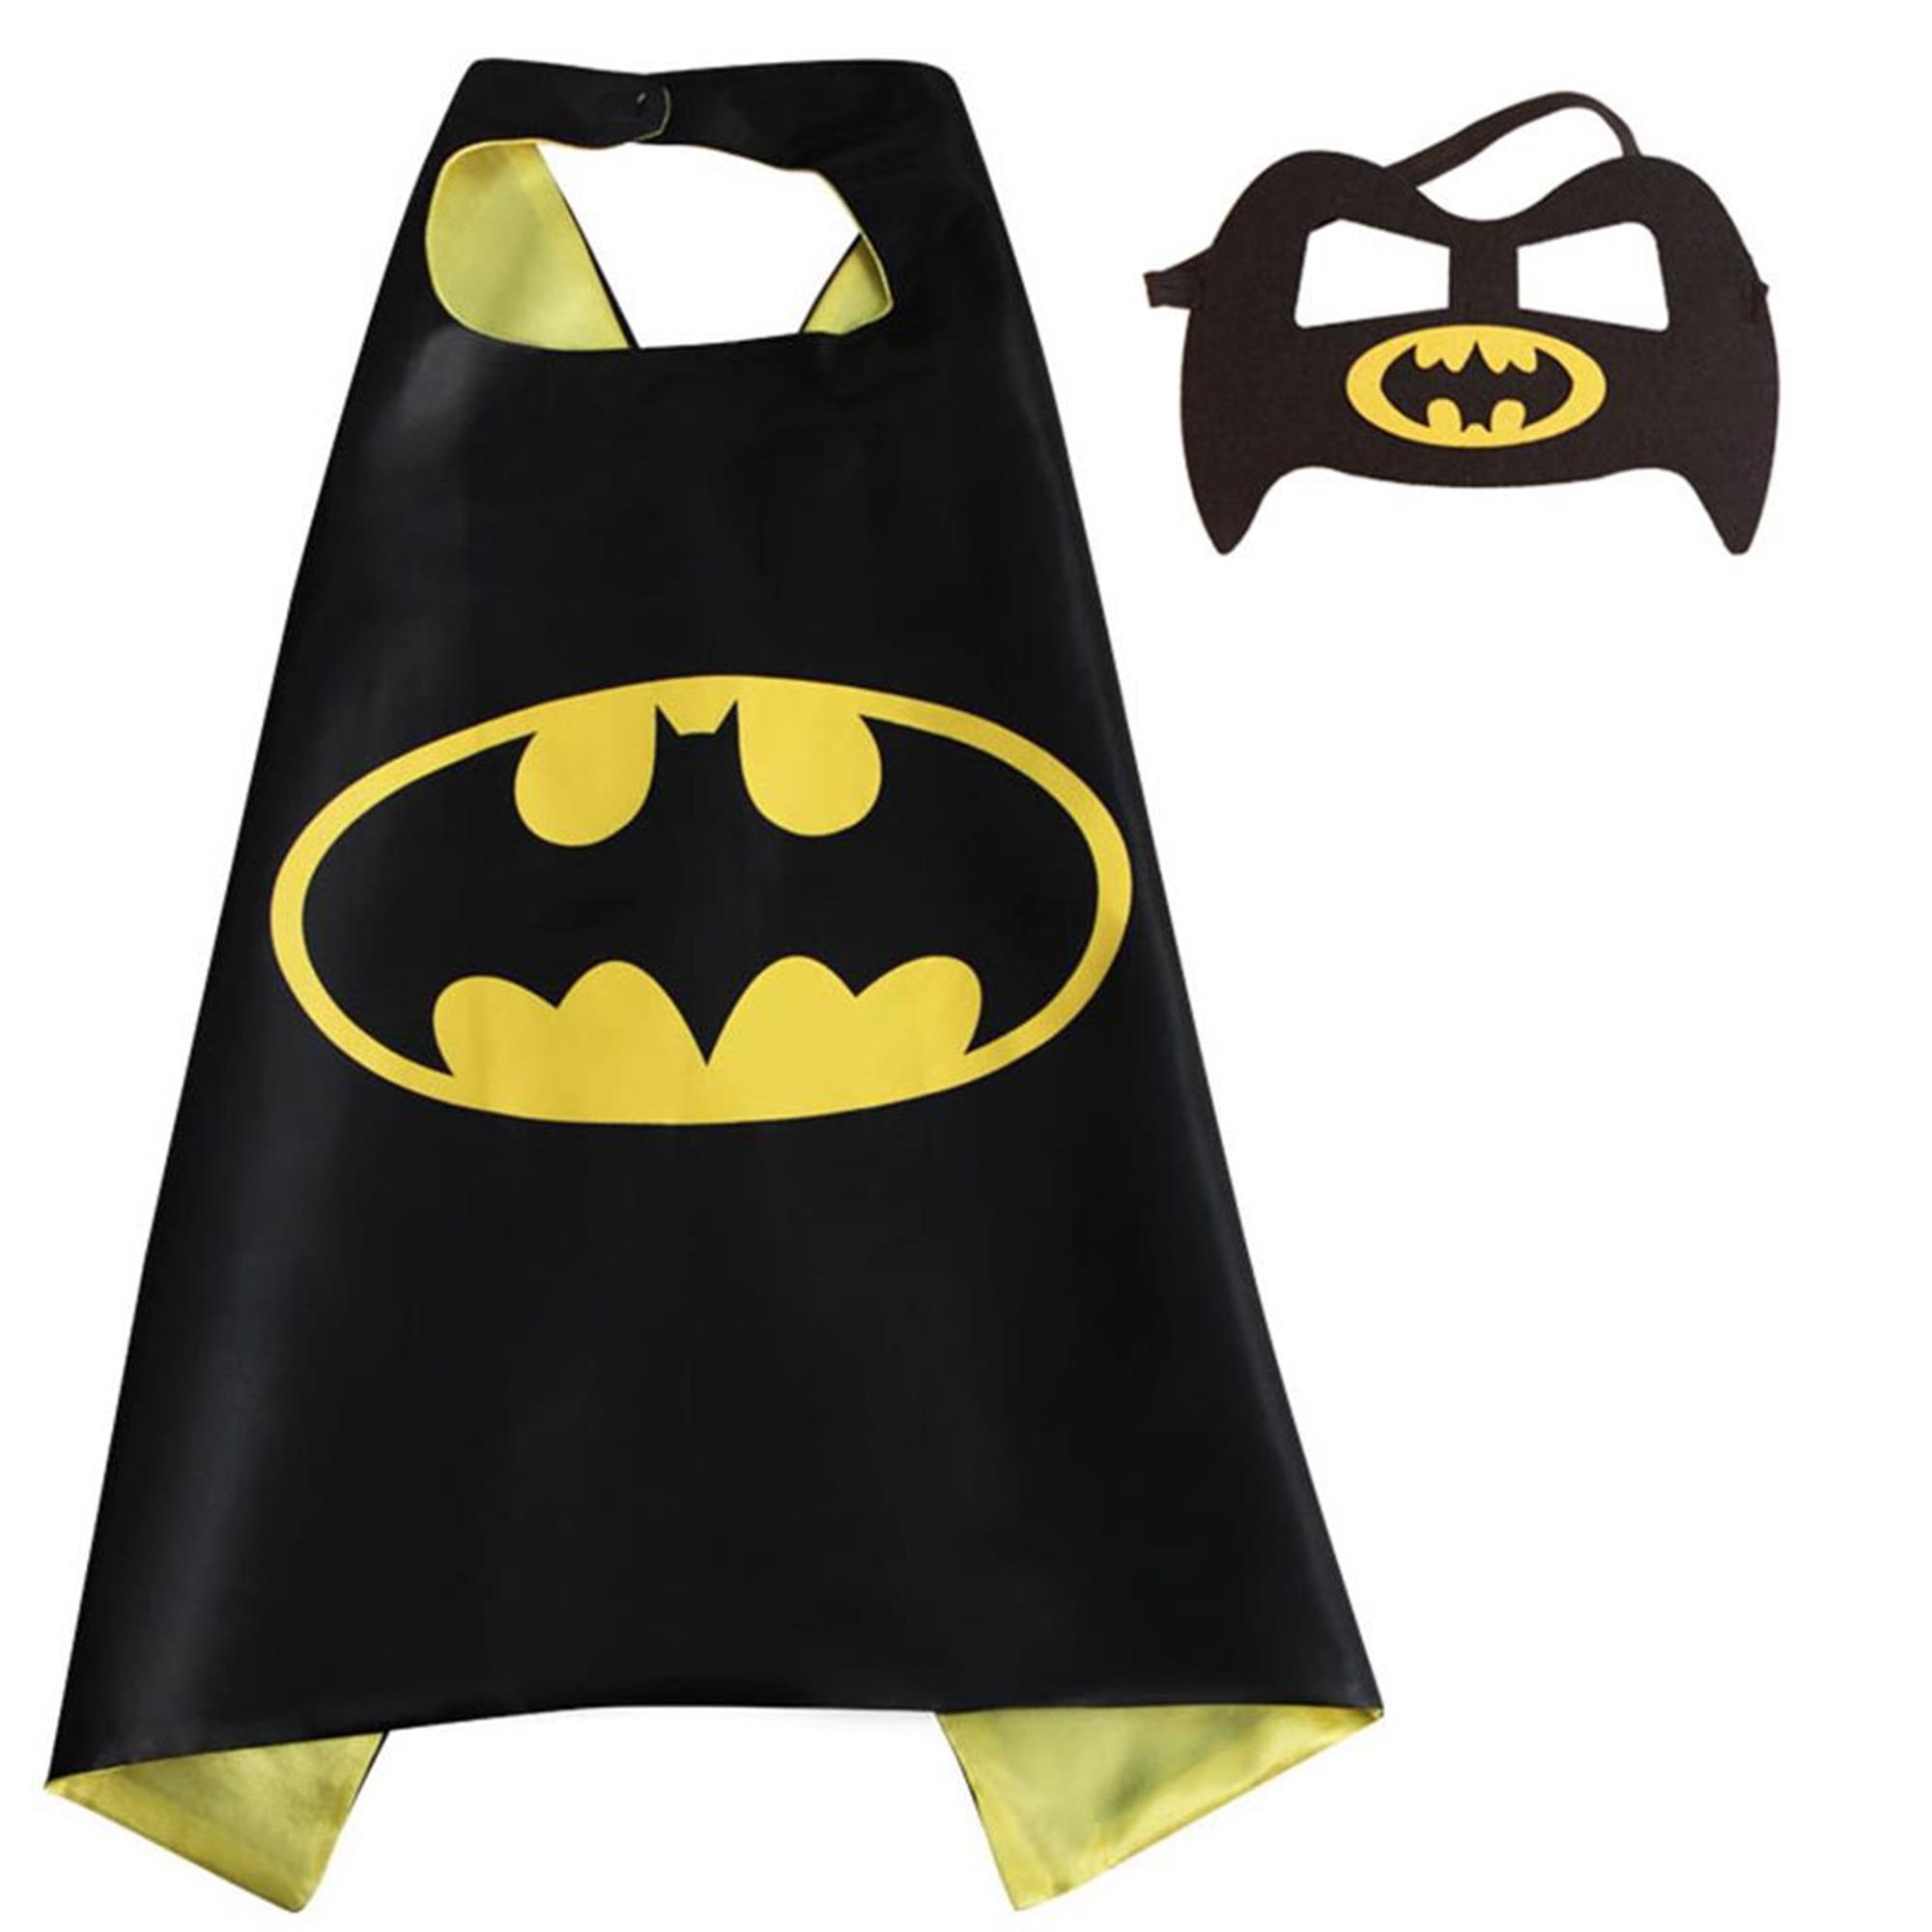 DC Comics Costume - Batman Bat Logo Cape and Mask with Gift Box by Superheroes